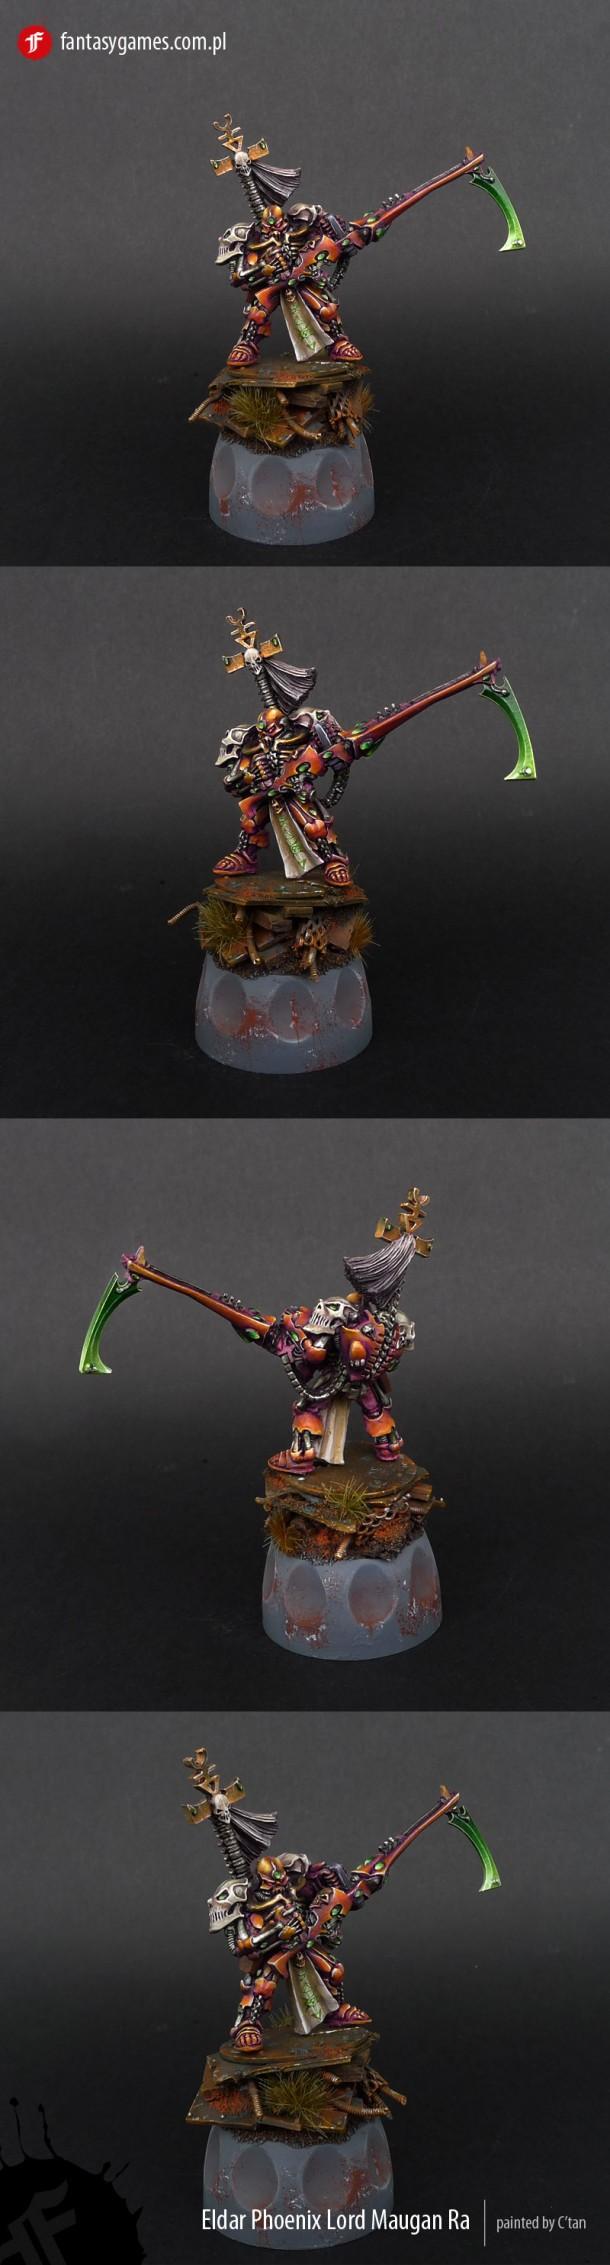 Eldar Phoenix Lord Maugan Ra